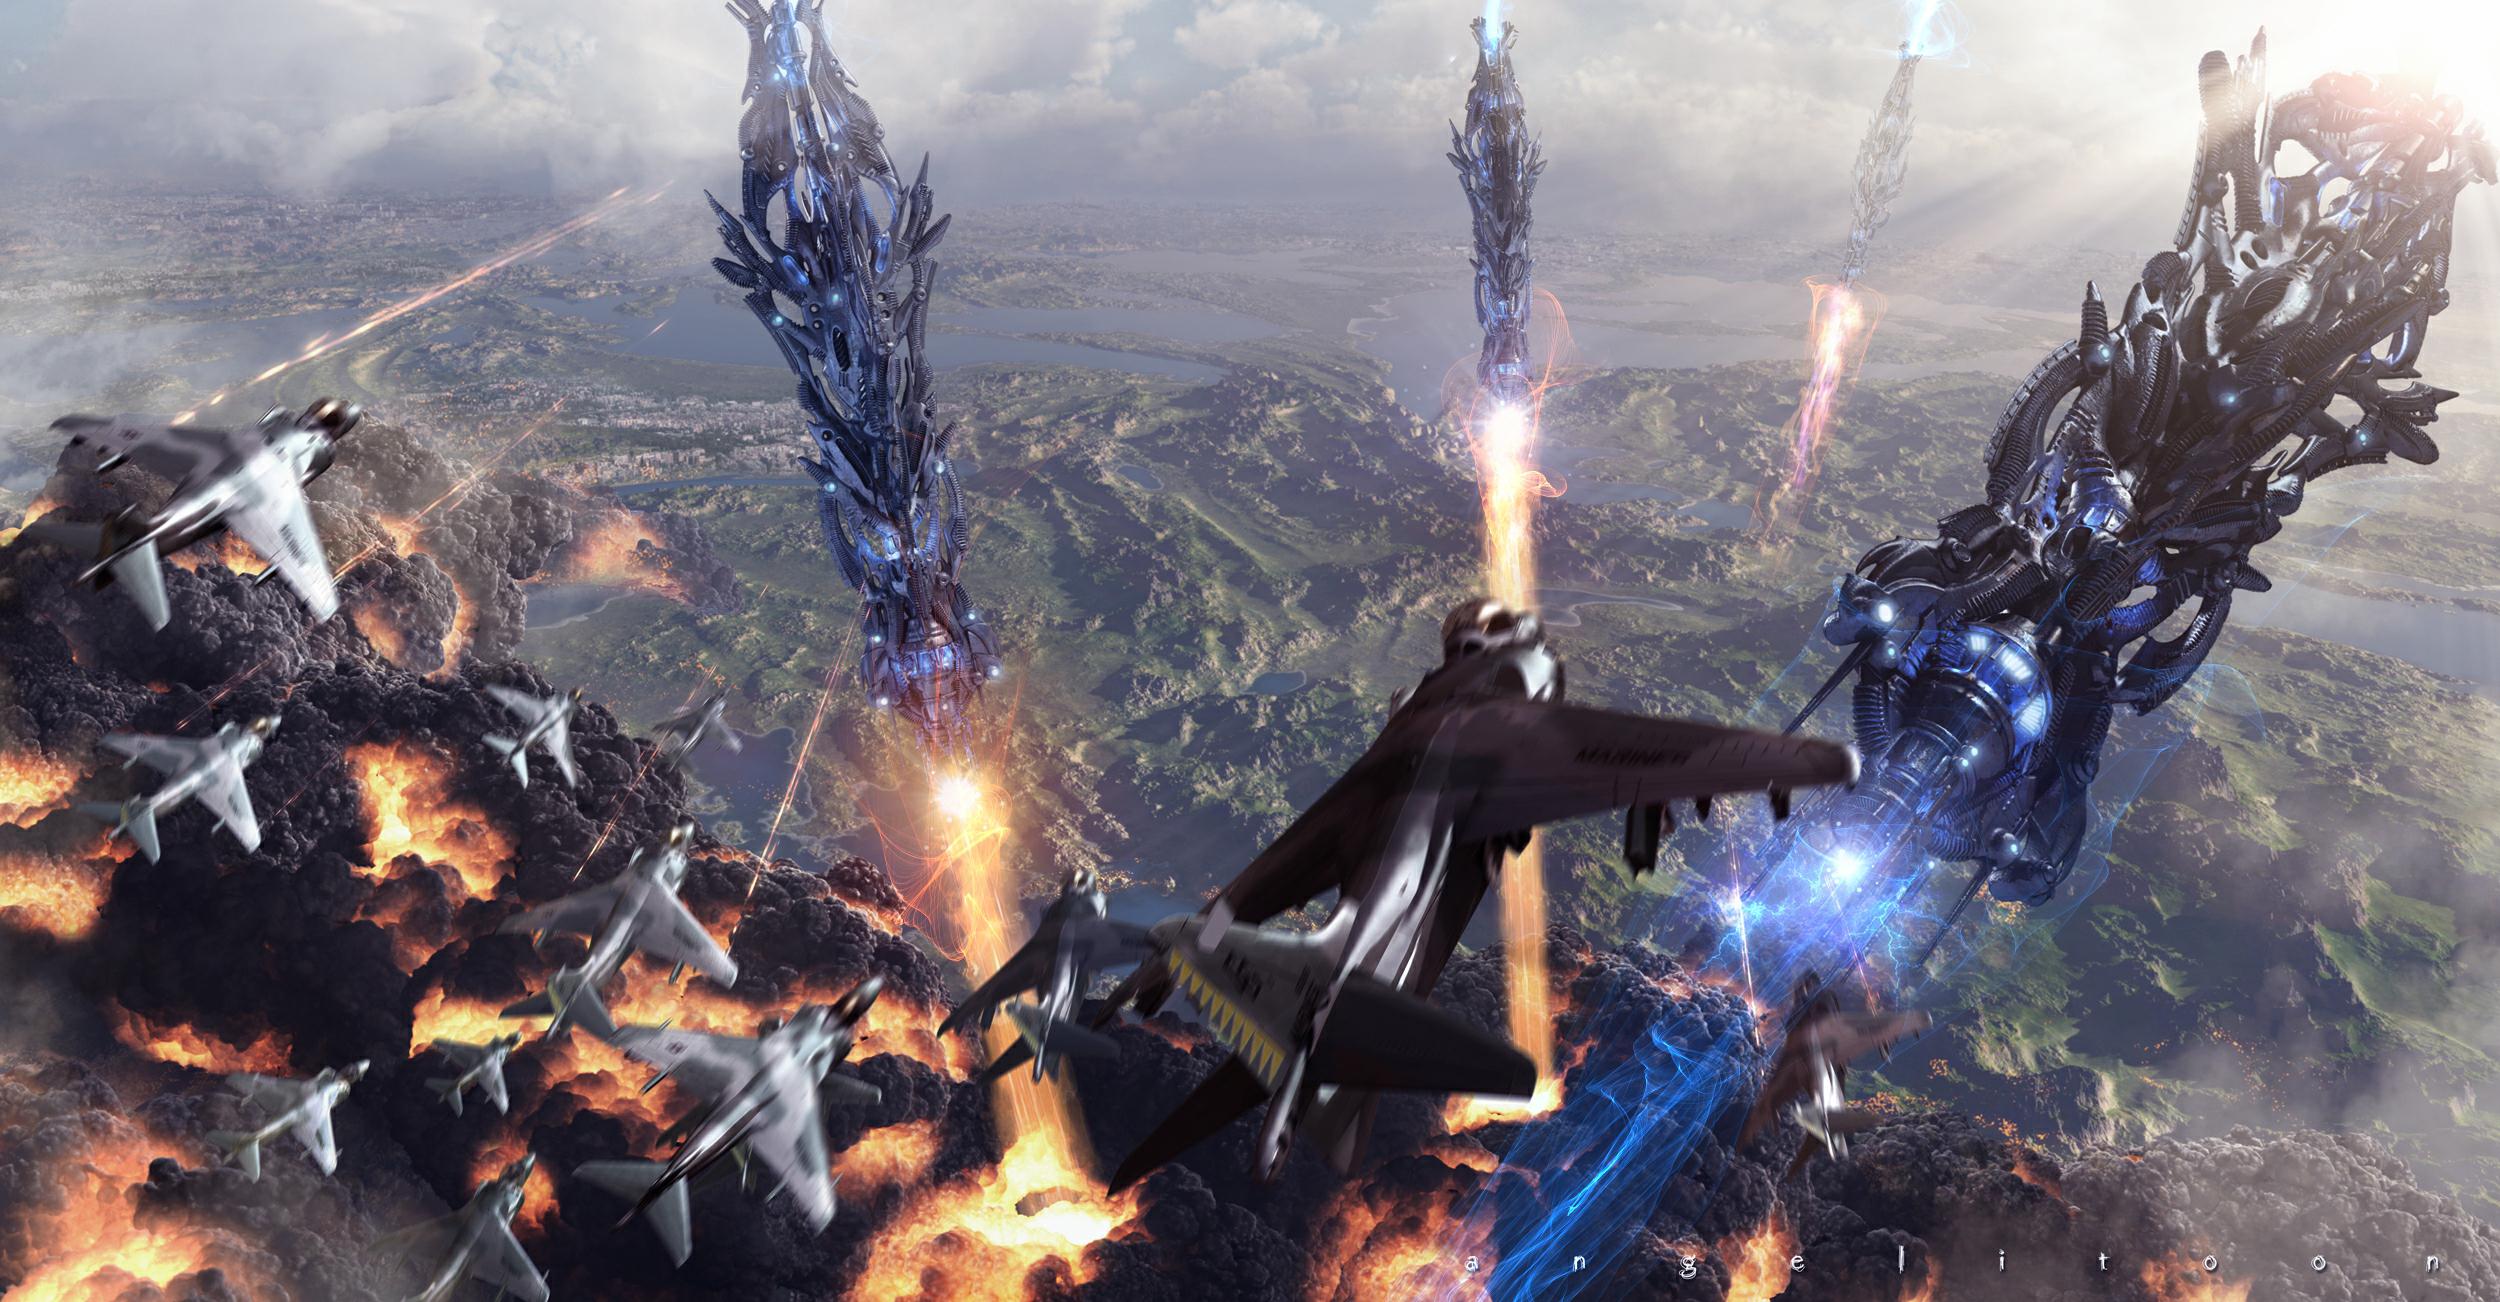 battle hd wallpaper background image 2500x1302 id